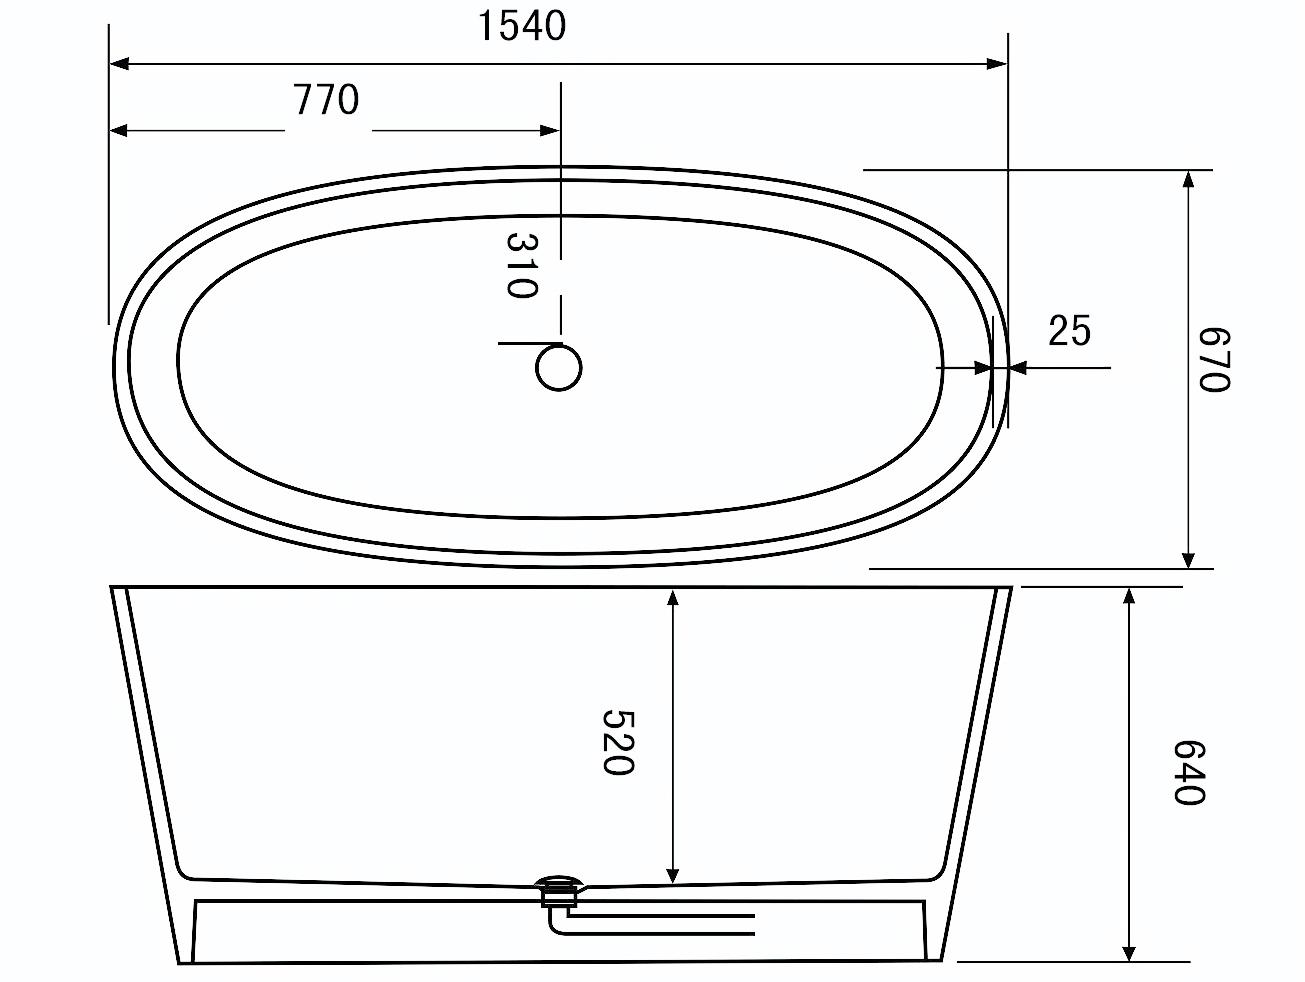 Bellissimo-Small deep freestanding bathroom solid surface bathtub on Bellissimo-3